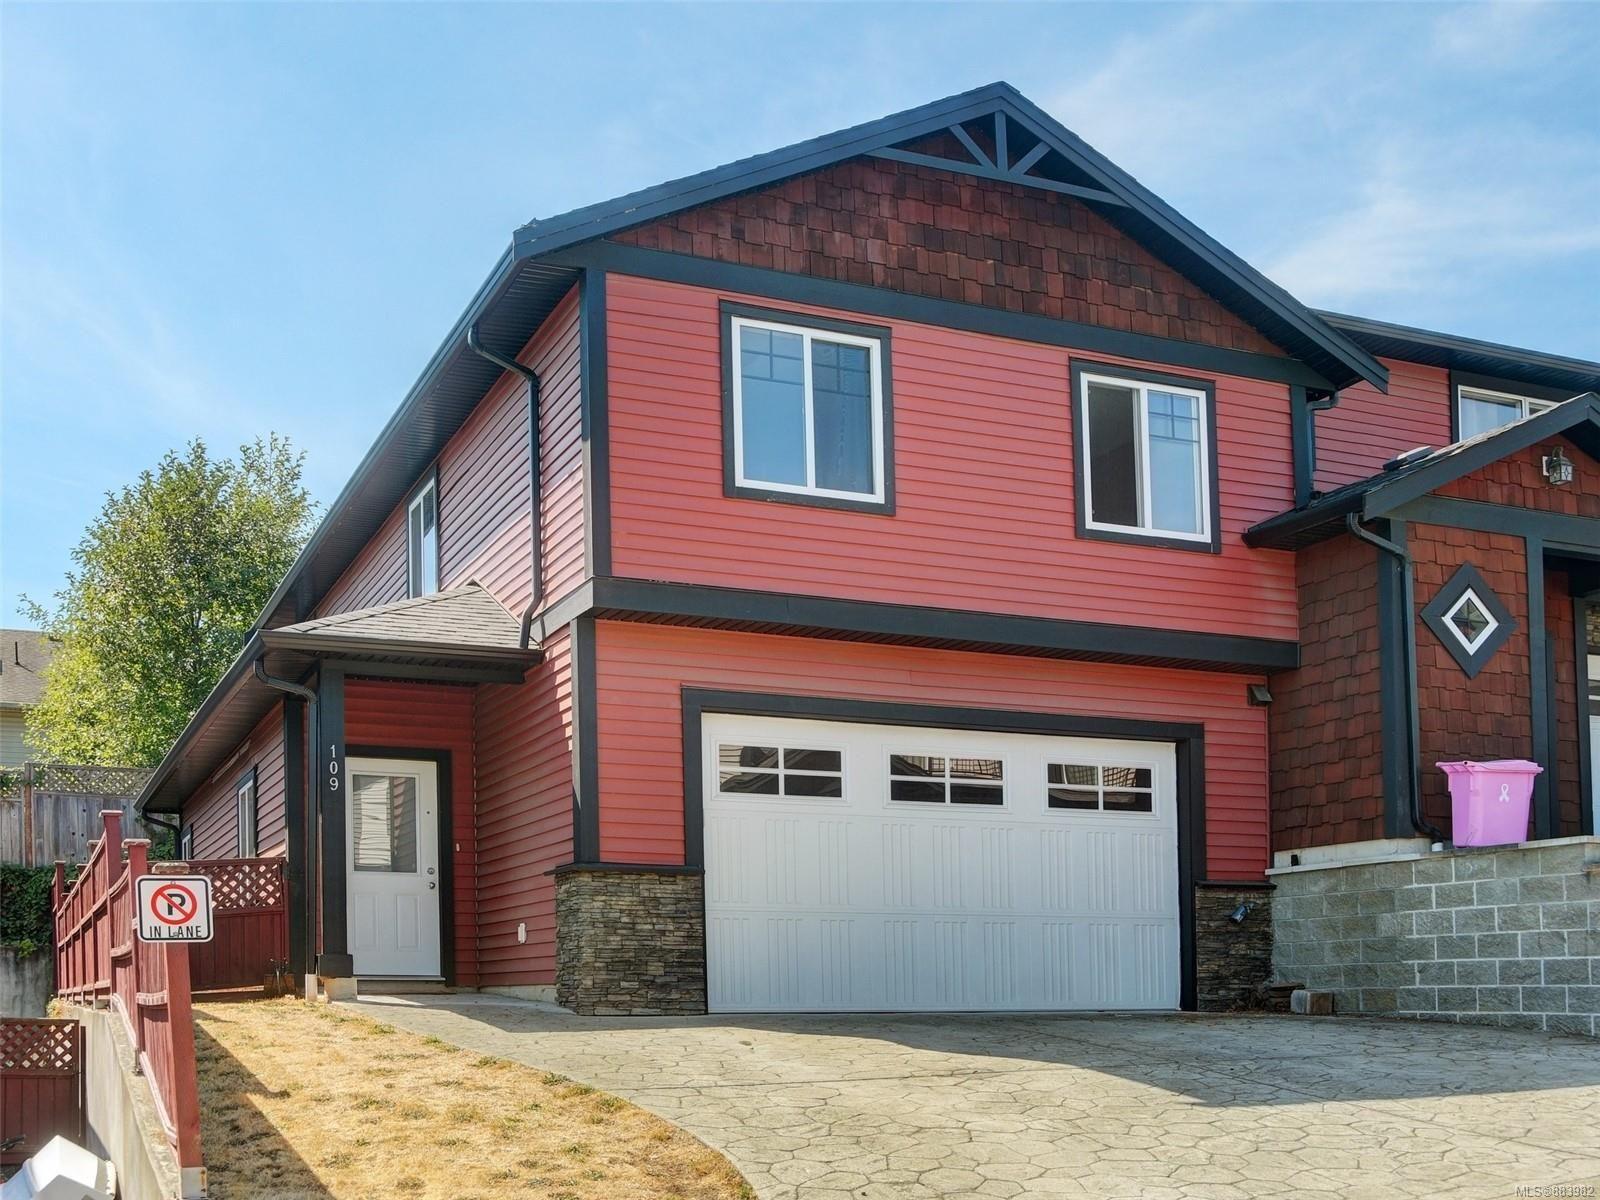 Main Photo: 109 6838 W Grant Rd in : Sk John Muir Row/Townhouse for sale (Sooke)  : MLS®# 883982